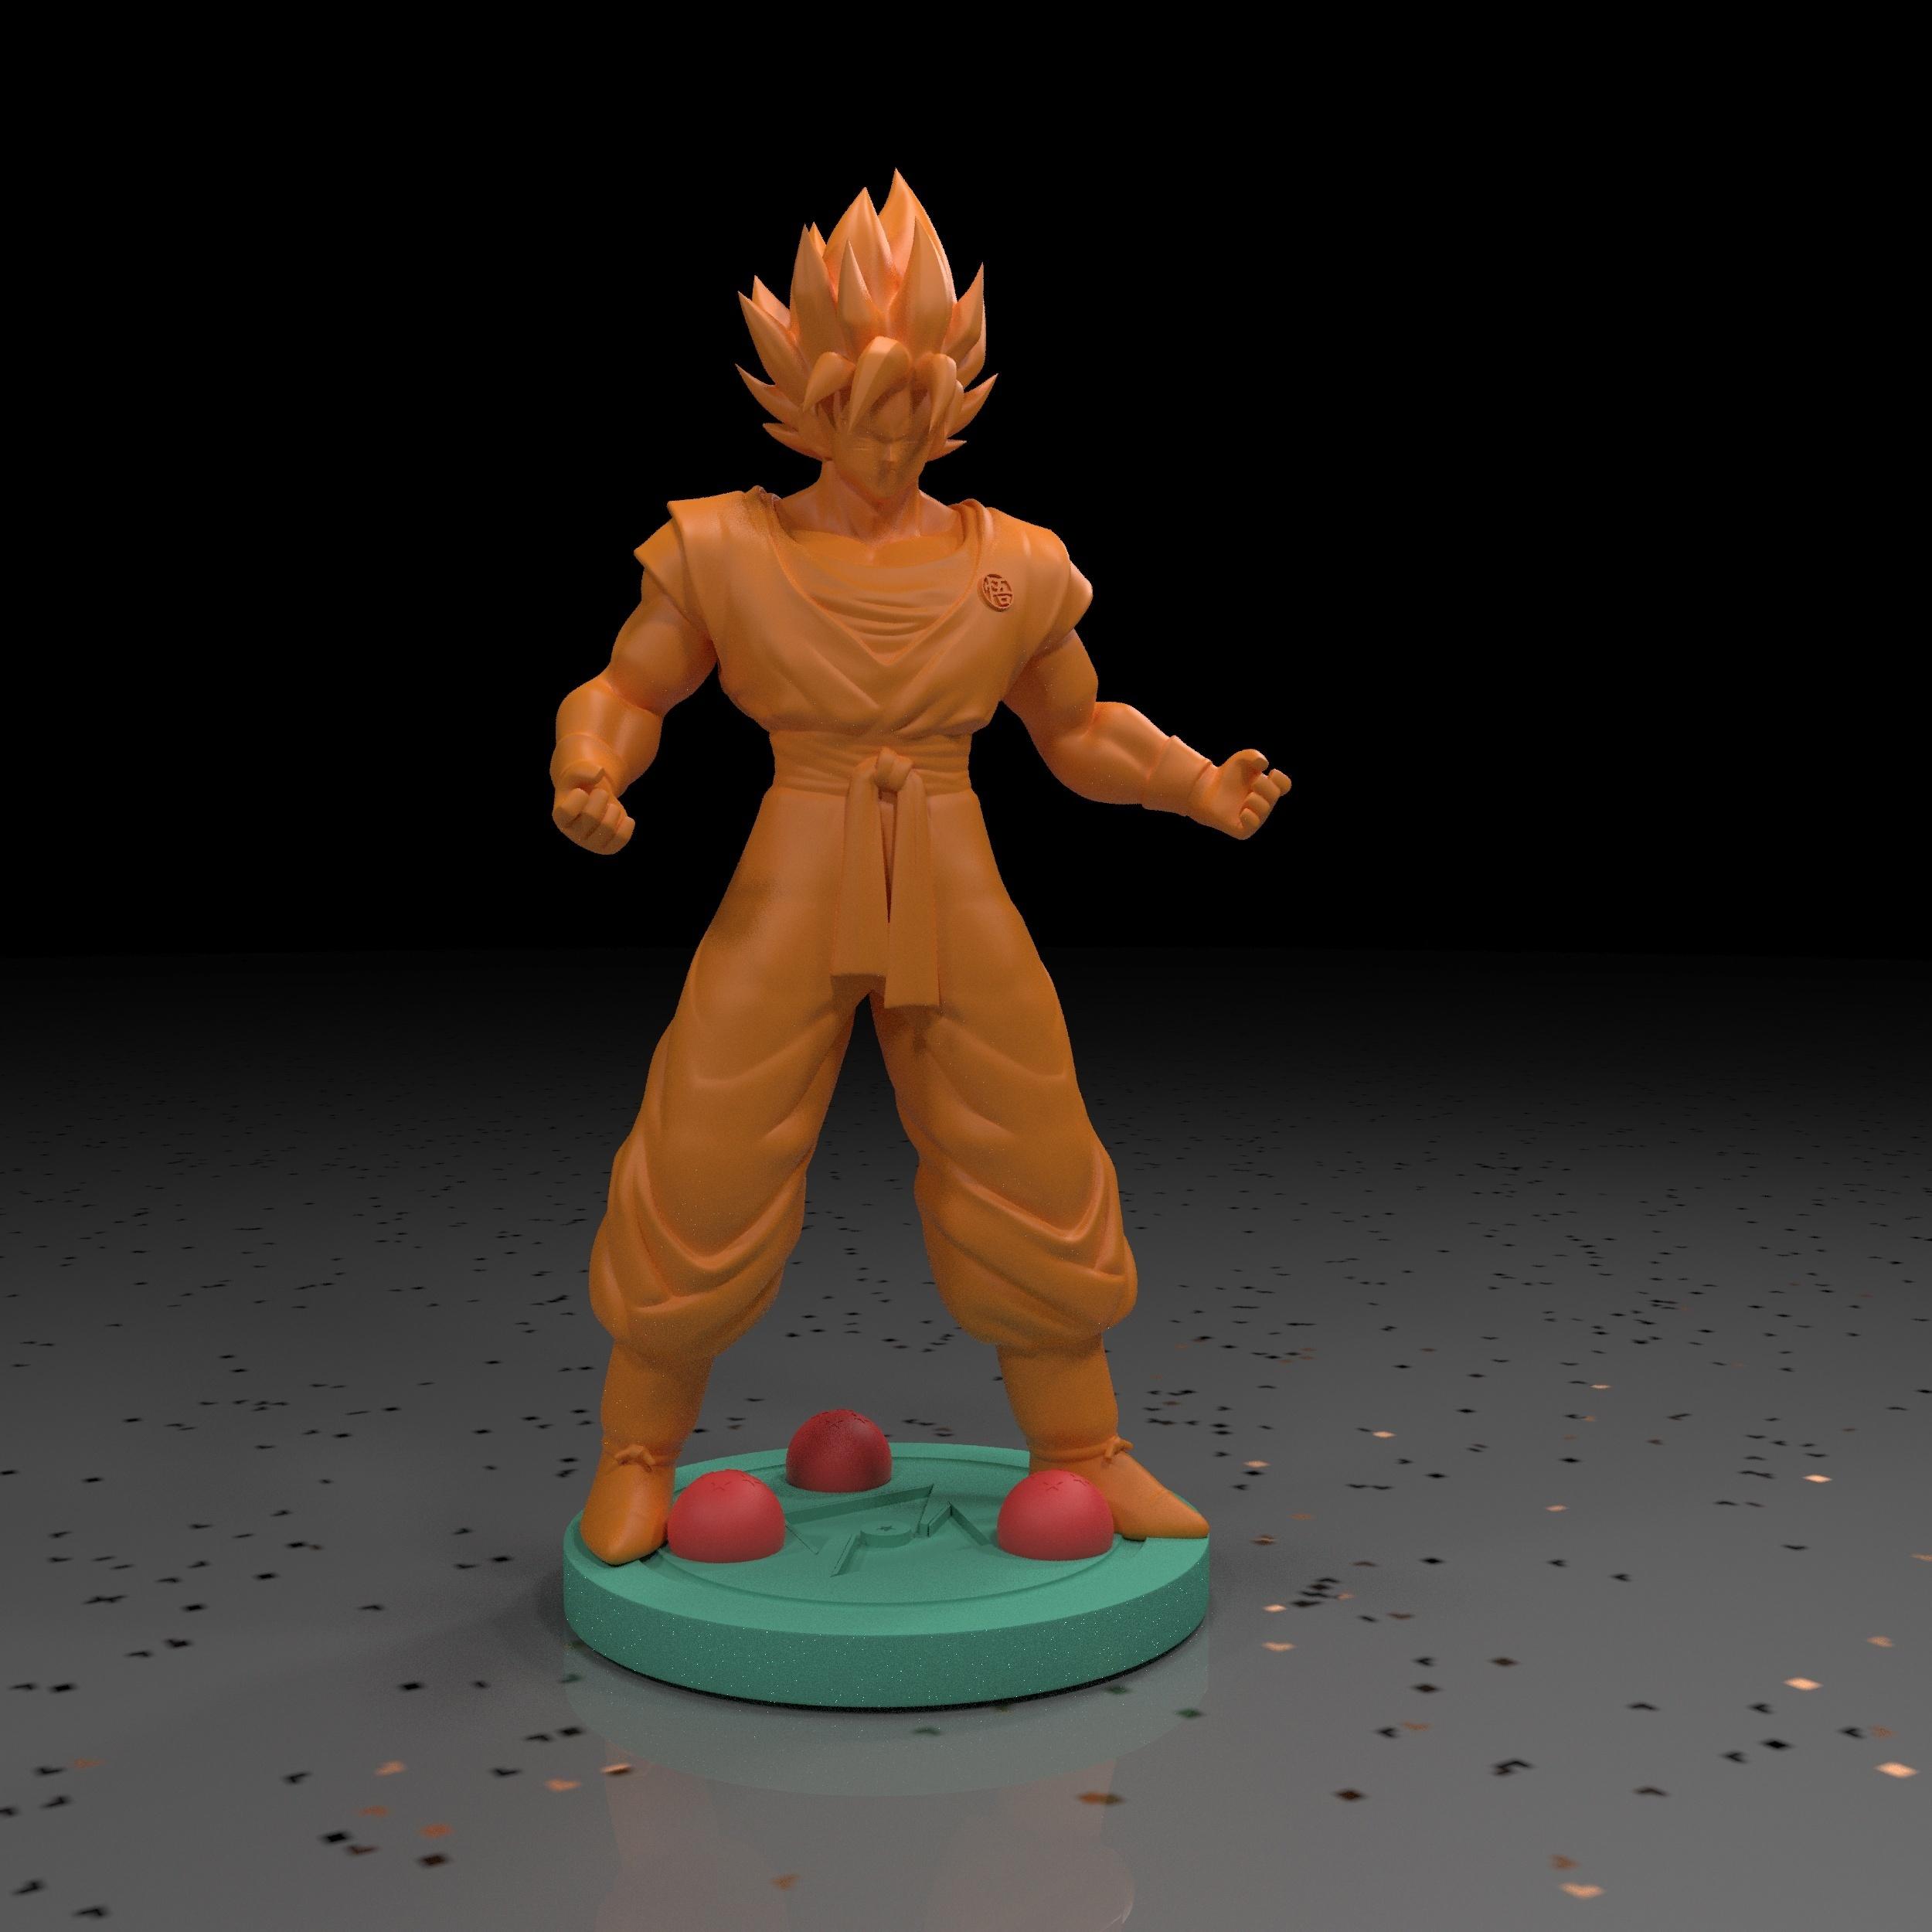 1.jpg Download free STL file Goku (Super Saiyan) • 3D printer template, paltony22